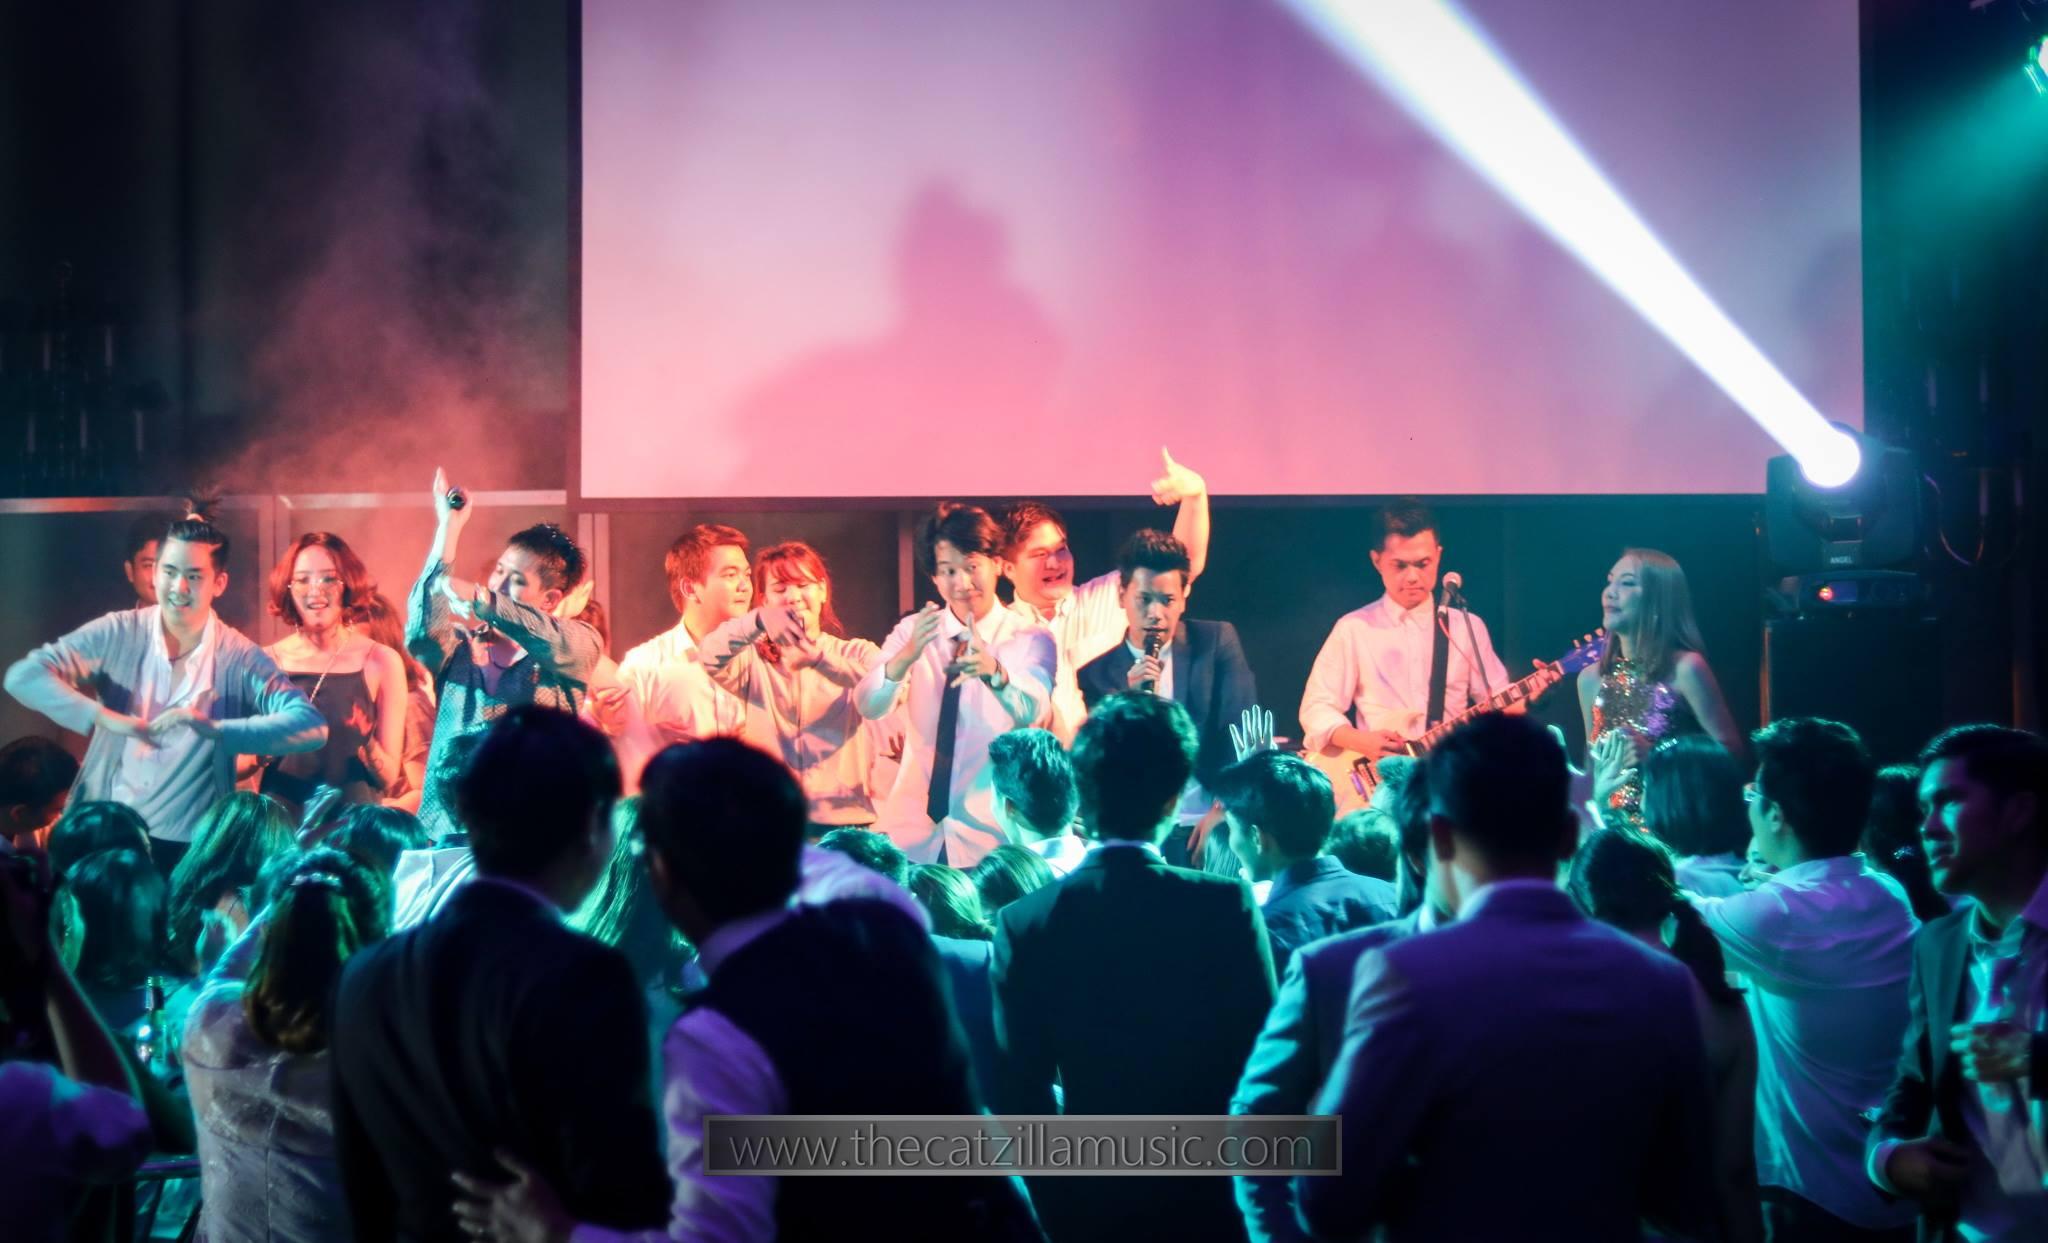 After-Party-Wedding-grand hyatt erawan-After Party งานแต่งงาน-แกรนด์ ไฮแอท เอราวัณ-วงดนตรีงานเลี้ยง-บุ๋นแบนด์-Catzilla